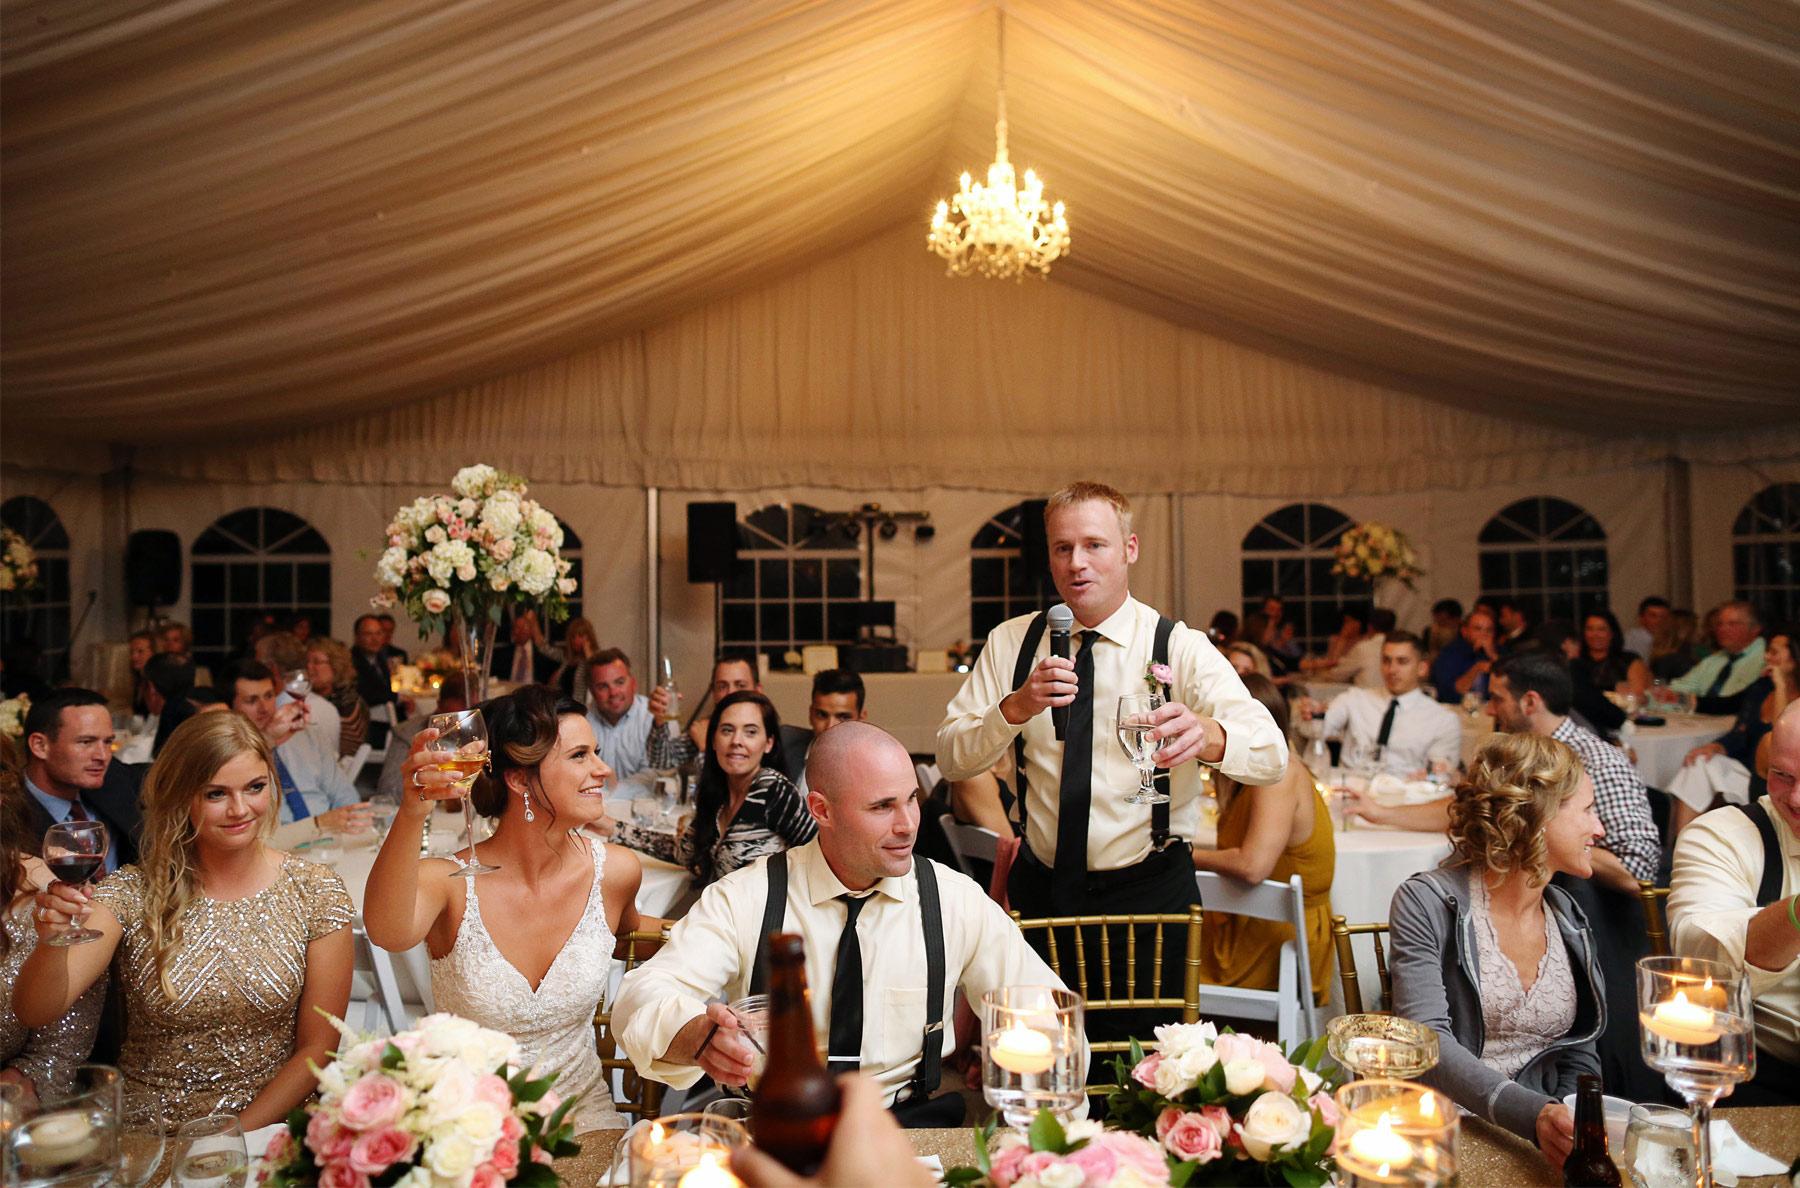 18-Stillwater-Minnesota-Wedding-Photography-by-Vick-Photography-Stone-Ridge-Golf-Club-Reception-Tara-&-Ryan.jpg